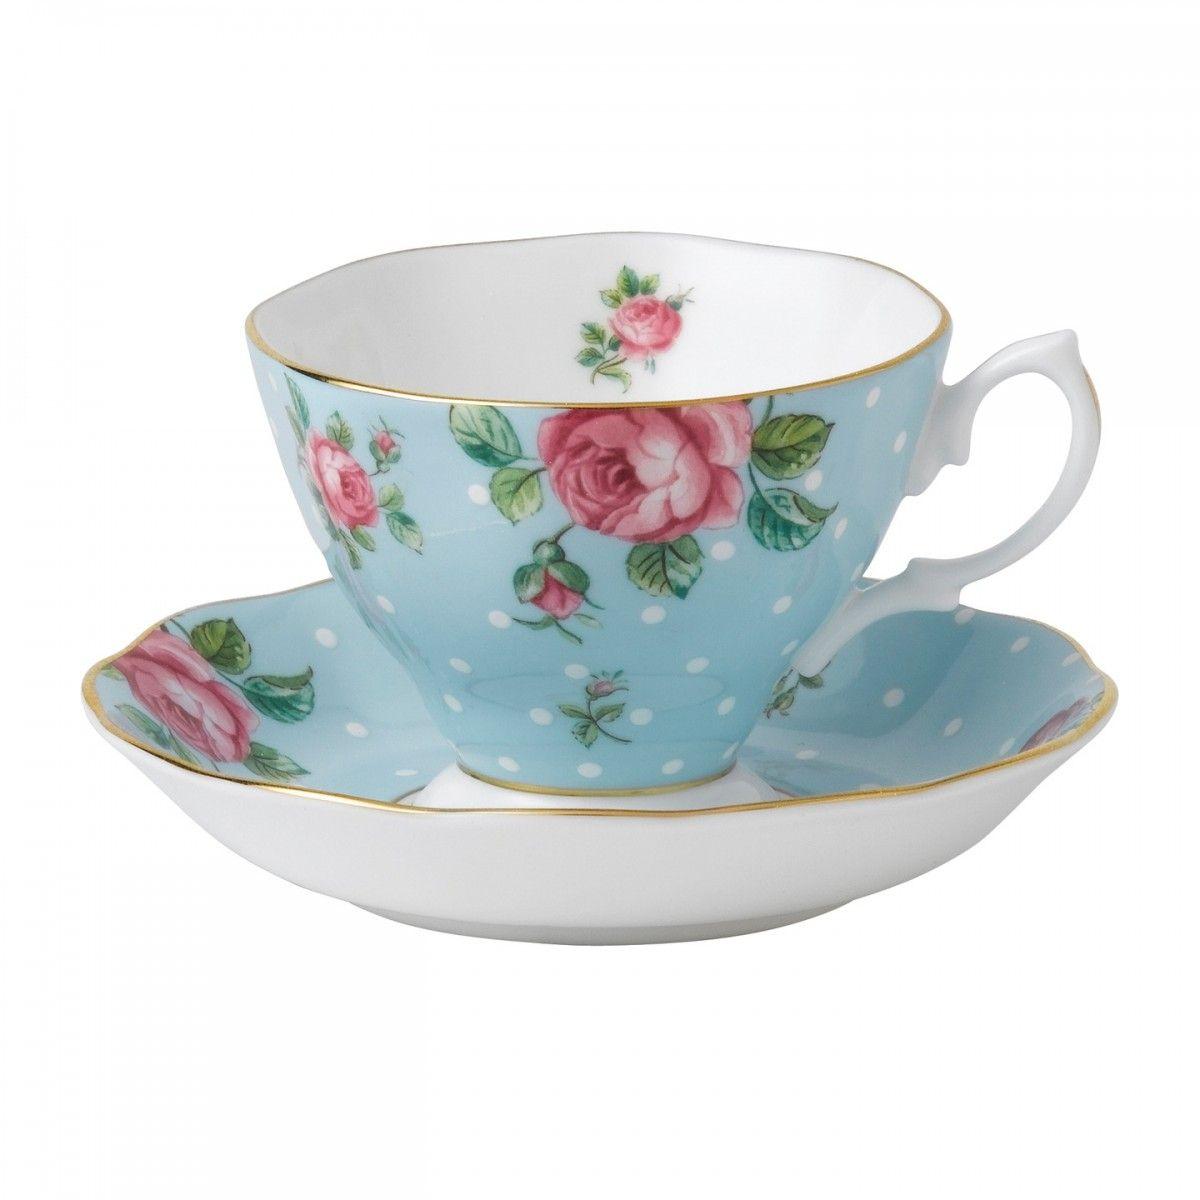 Royal Albert New Country Roses Polka Blue Vintage Formal Teacup Saucer Boxed Set